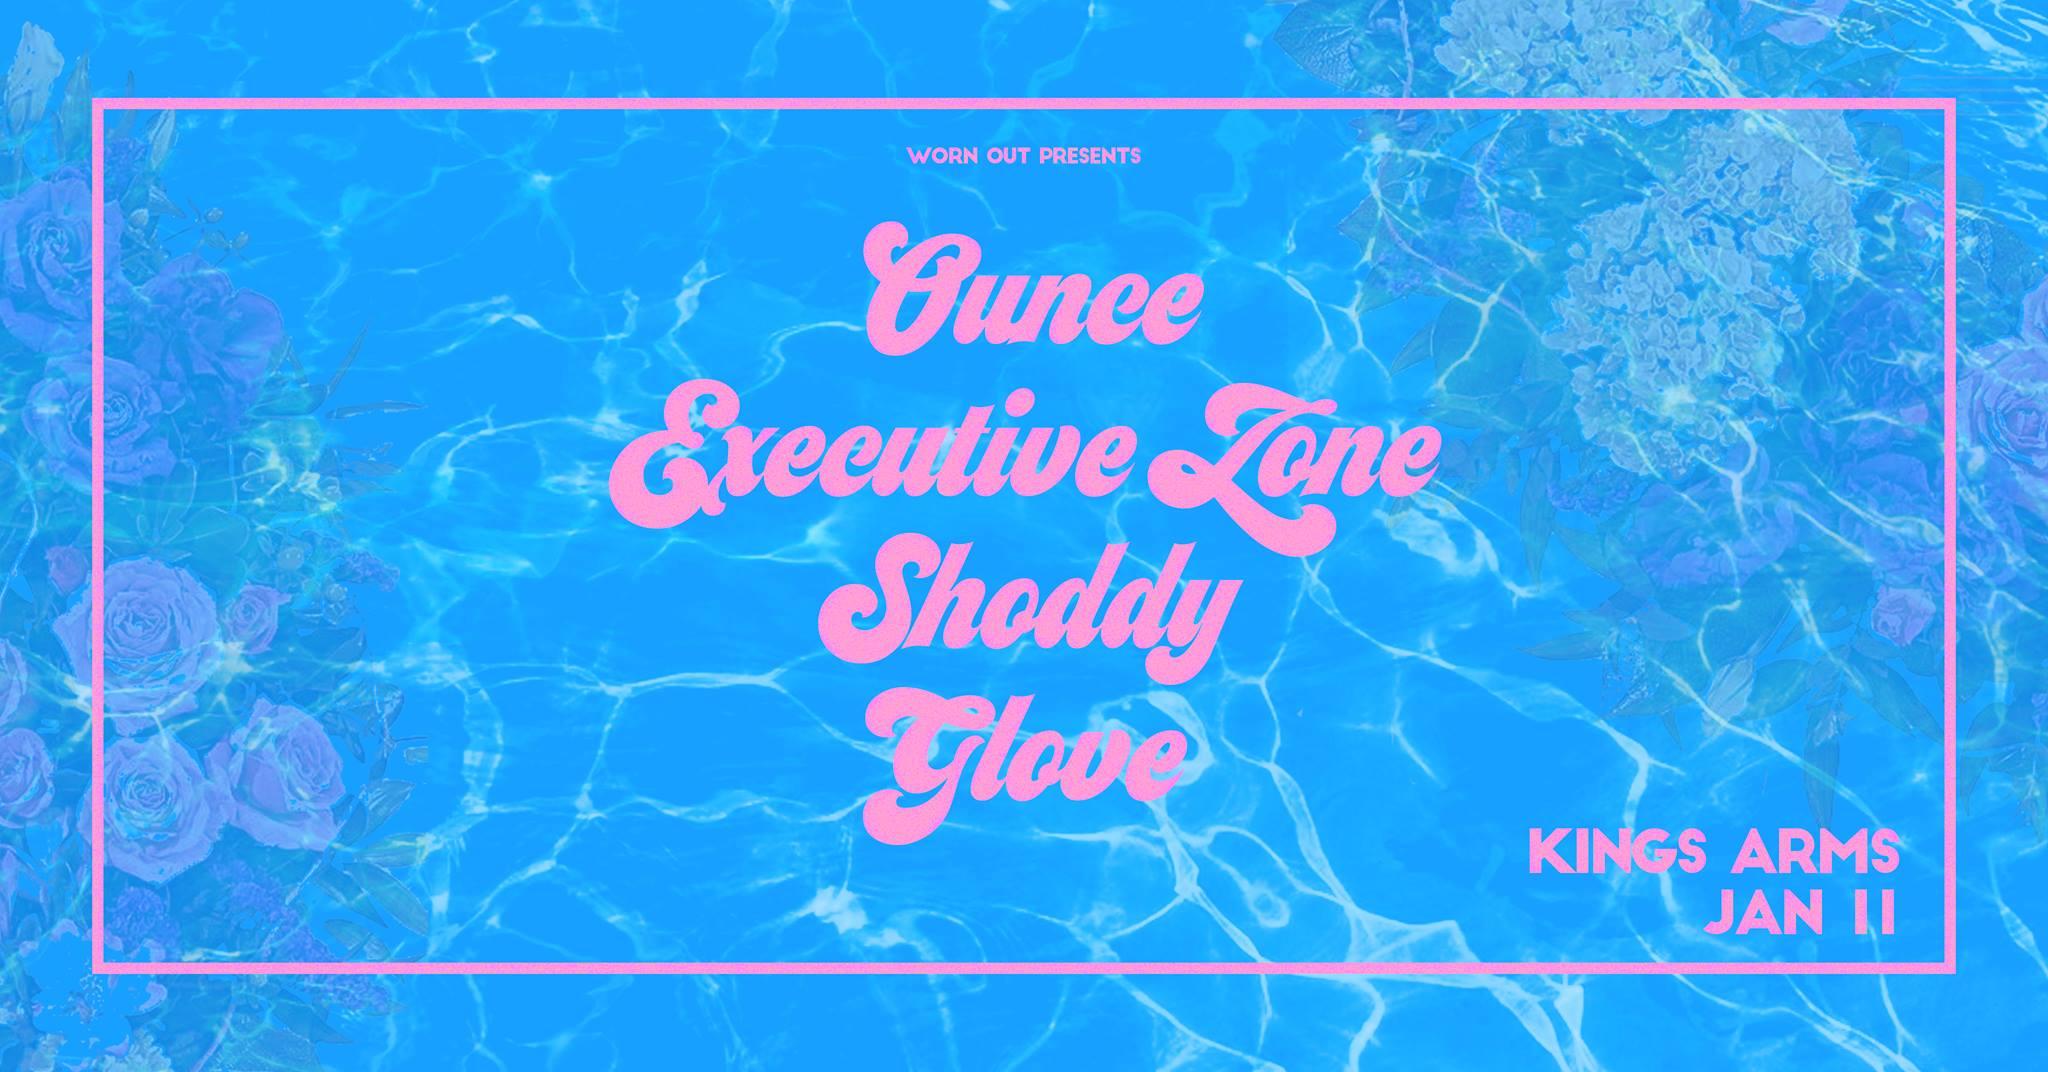 Ounce, Executive Zone, Shoddy And Glove